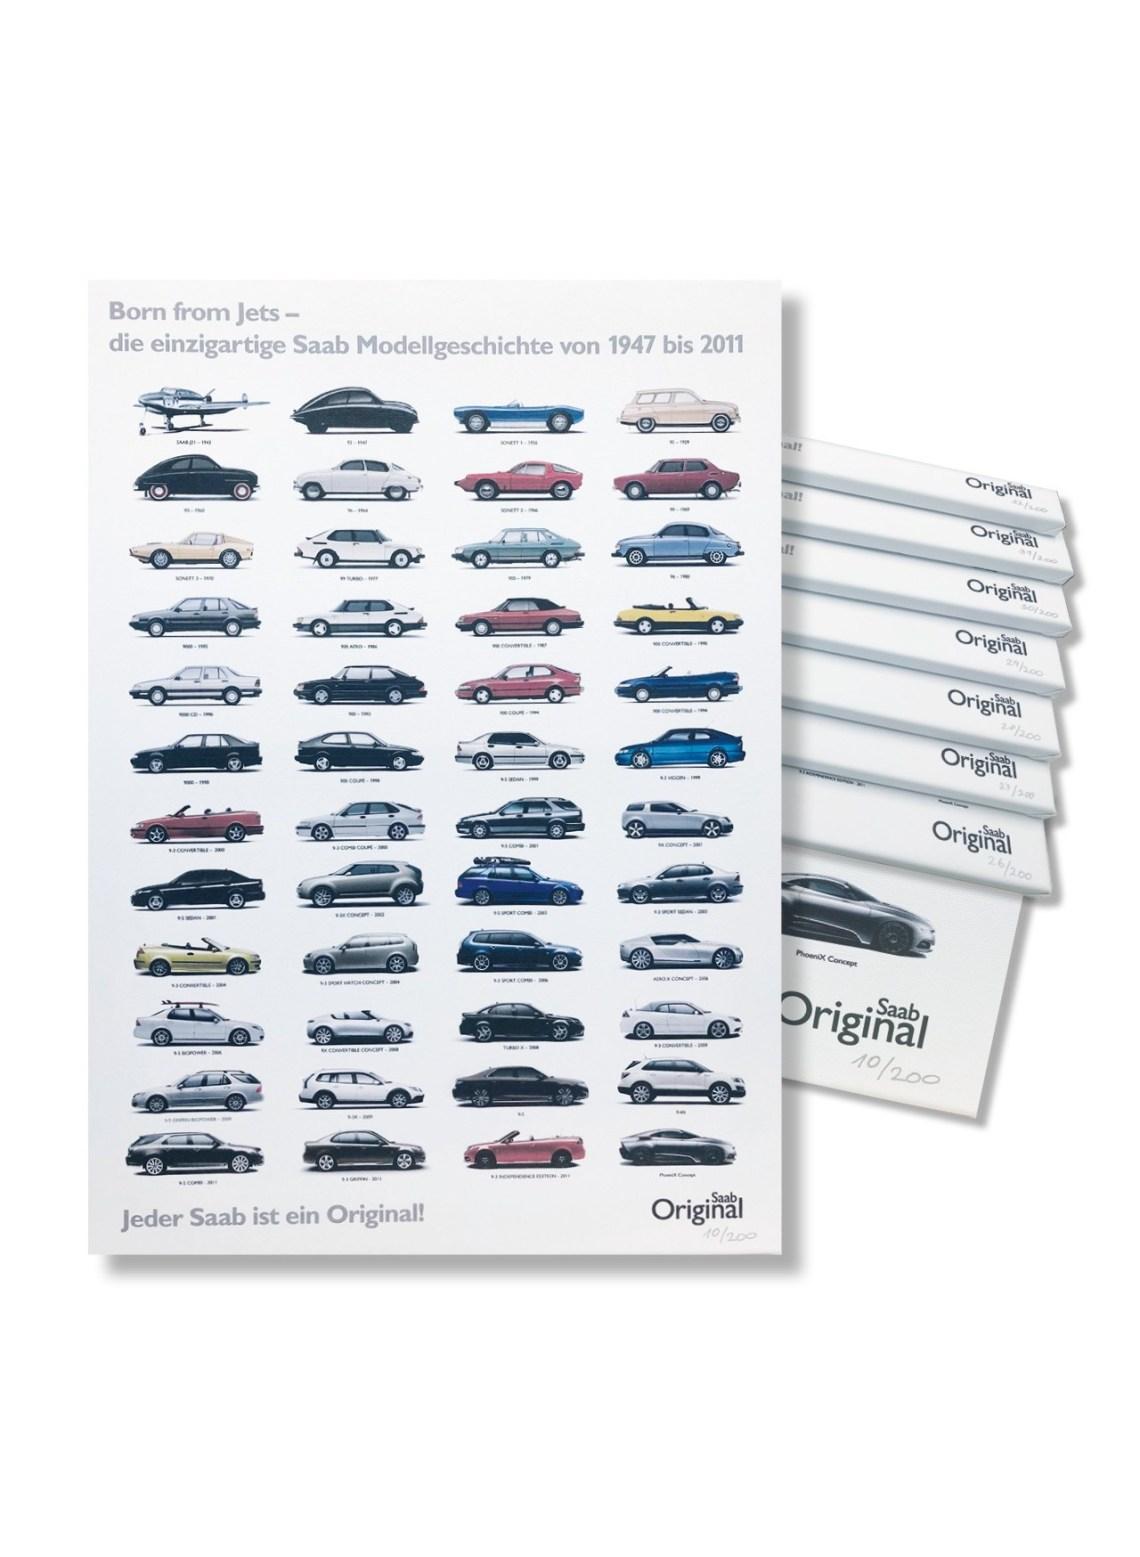 En exklusiv Saab-vara. Saab historia som en kanvasbild